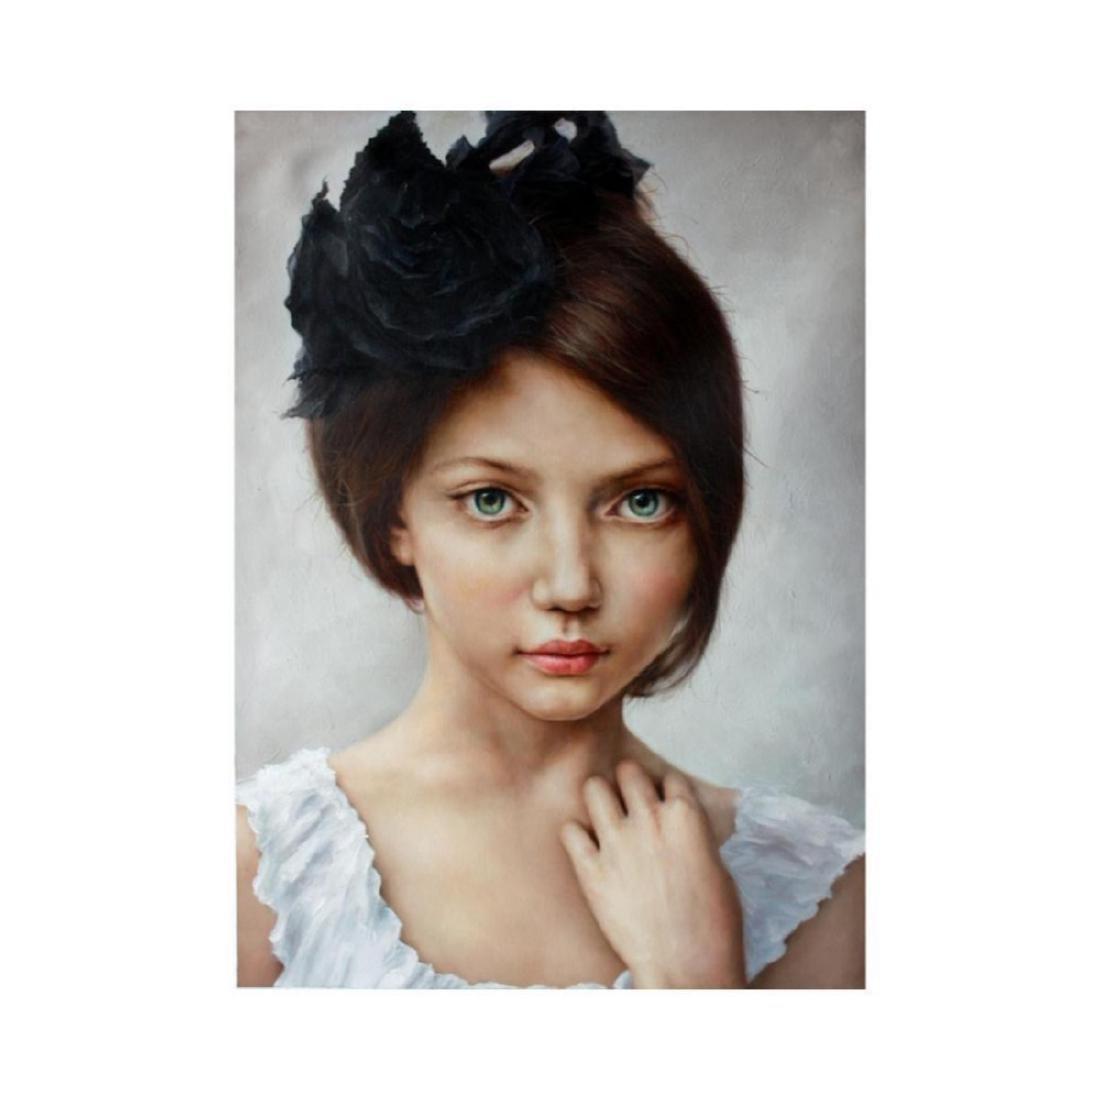 21st Century Photorealism, Signed Portrait, Little Girl